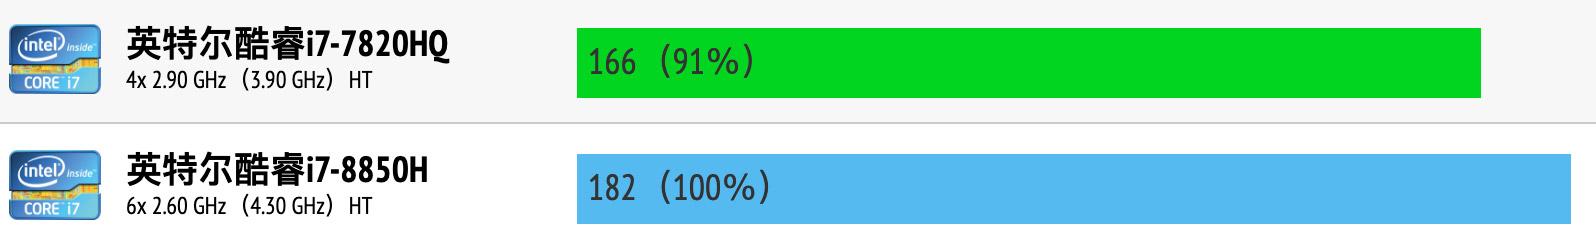 Intel Core i7-7820HQ和i7-8850H性能跑分对比评测